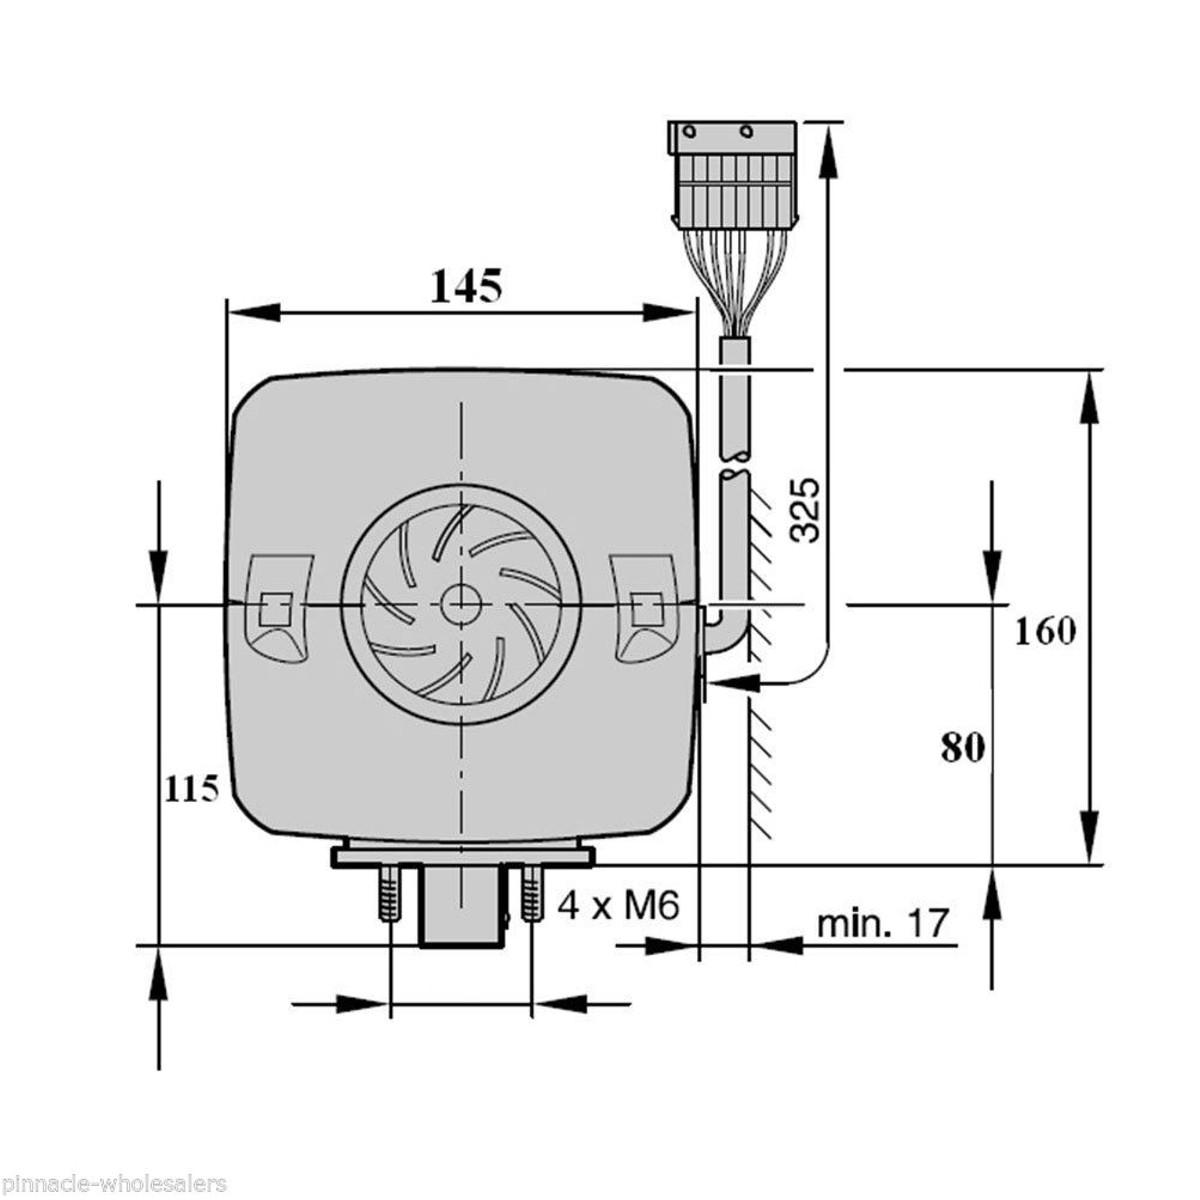 12V 5KW Diesel Air Parking Heater Diesel Heating Air Parking Heater with Control Switch